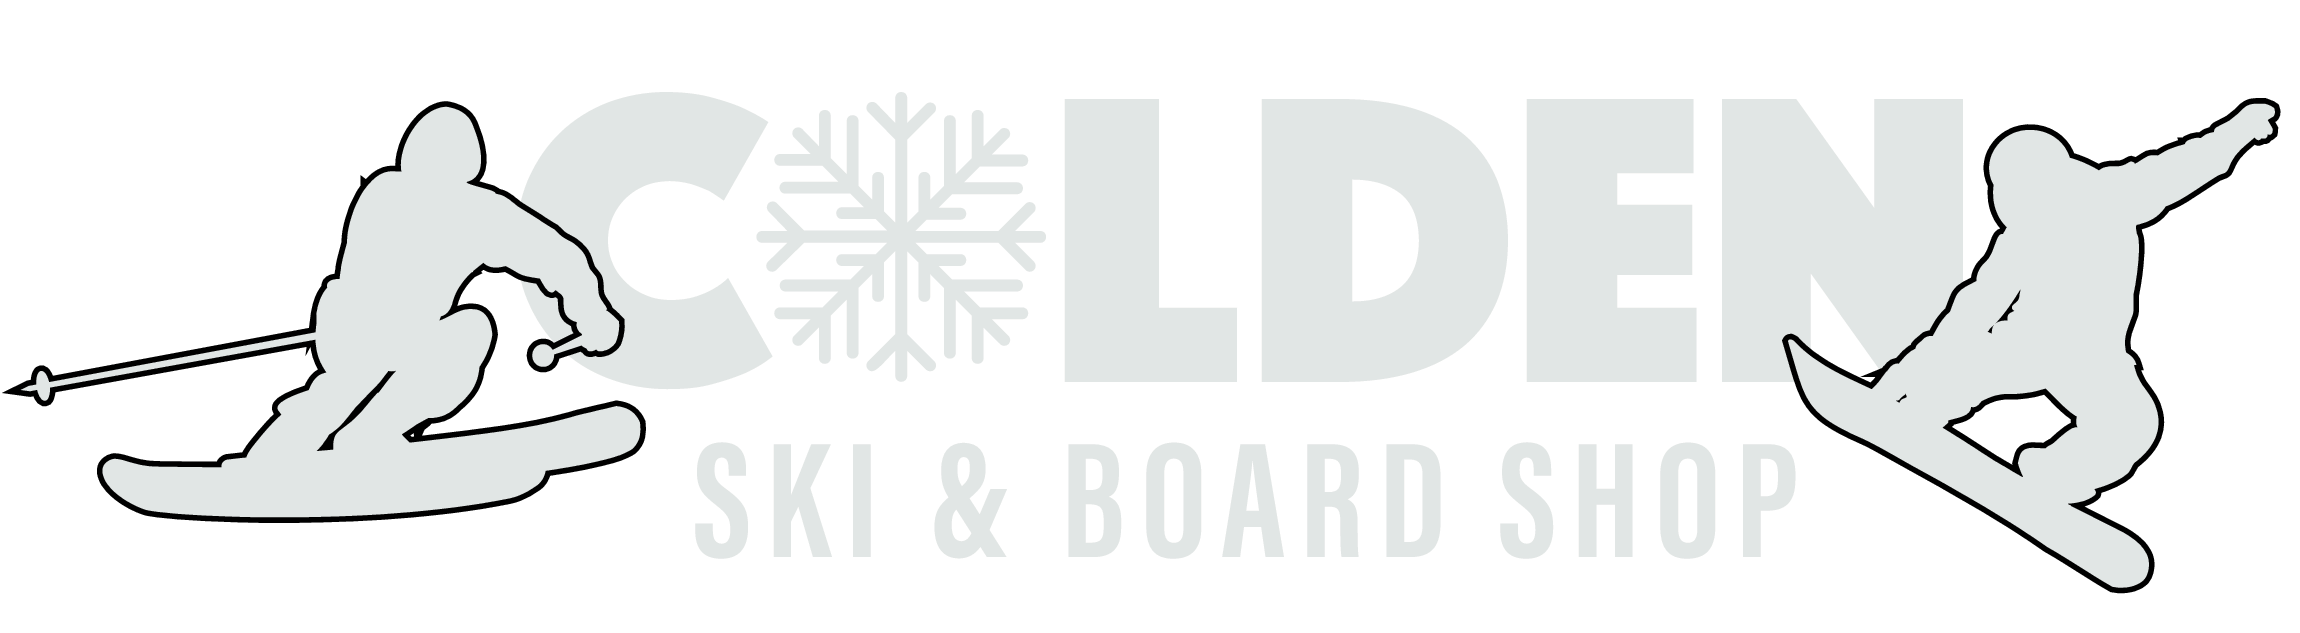 Colden Ski & Board